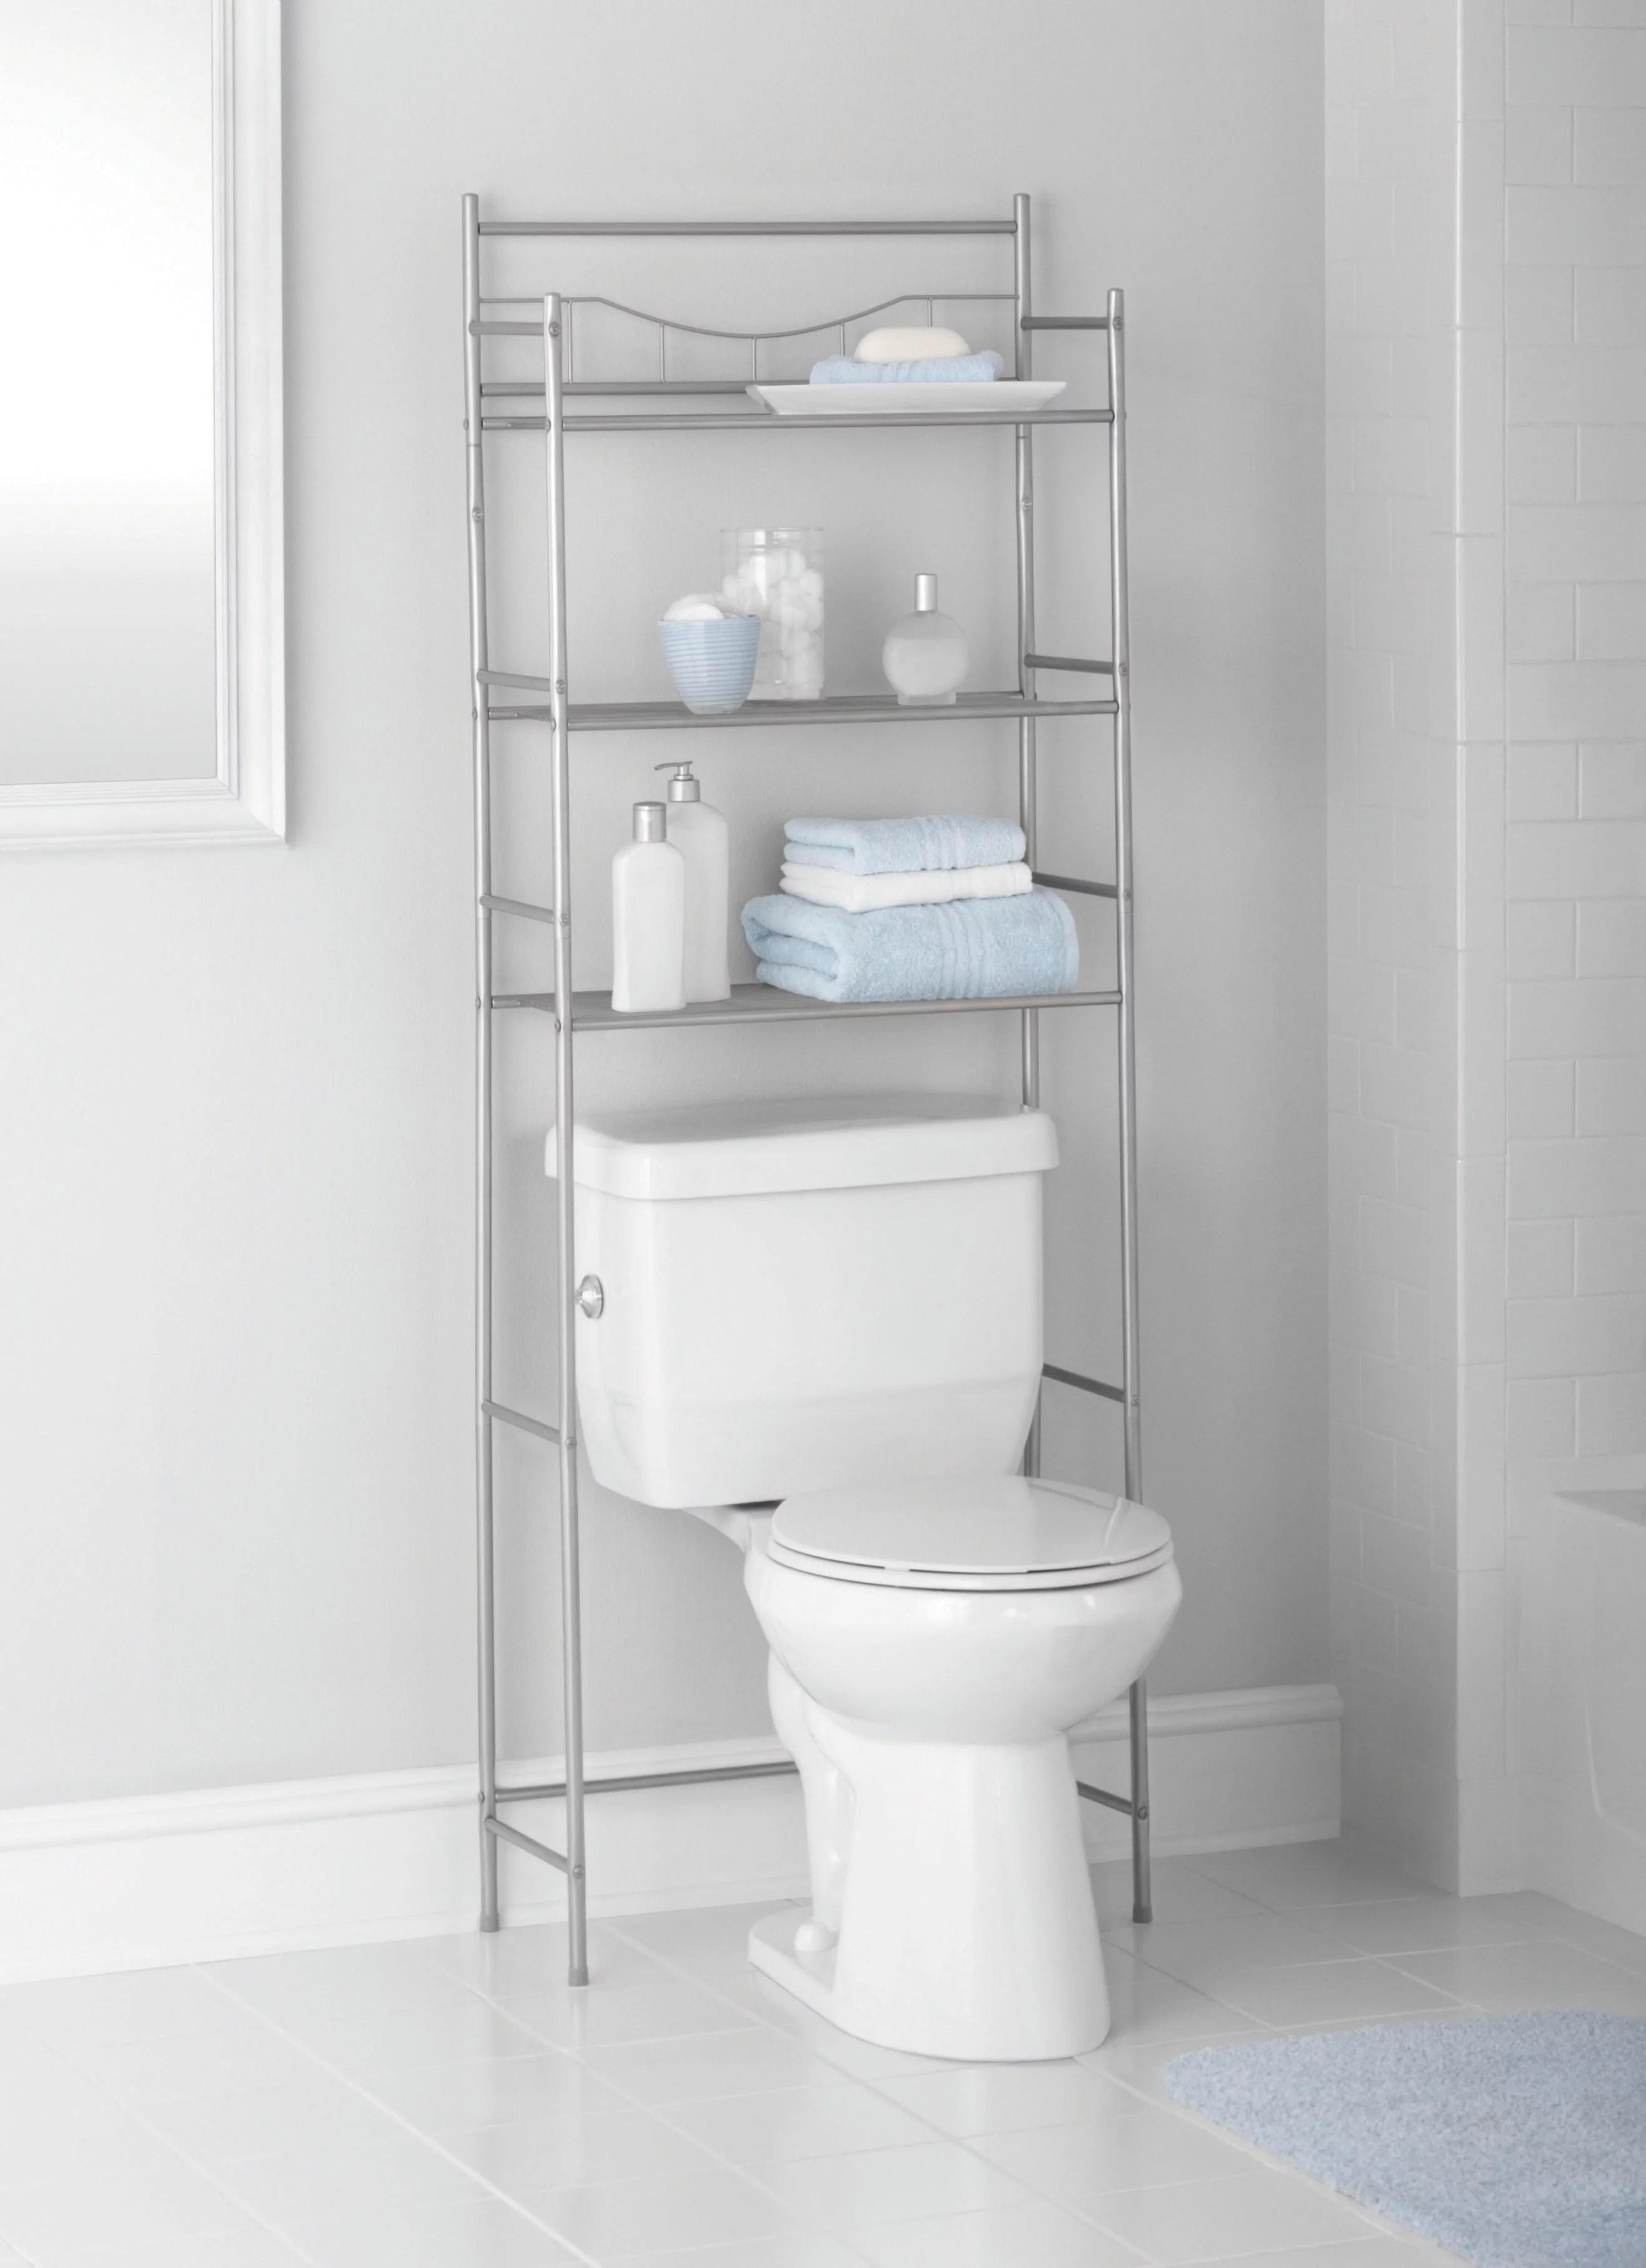 mainstays 3 shelf bathroom over the toilet space saver with liner satin nickel walmart com